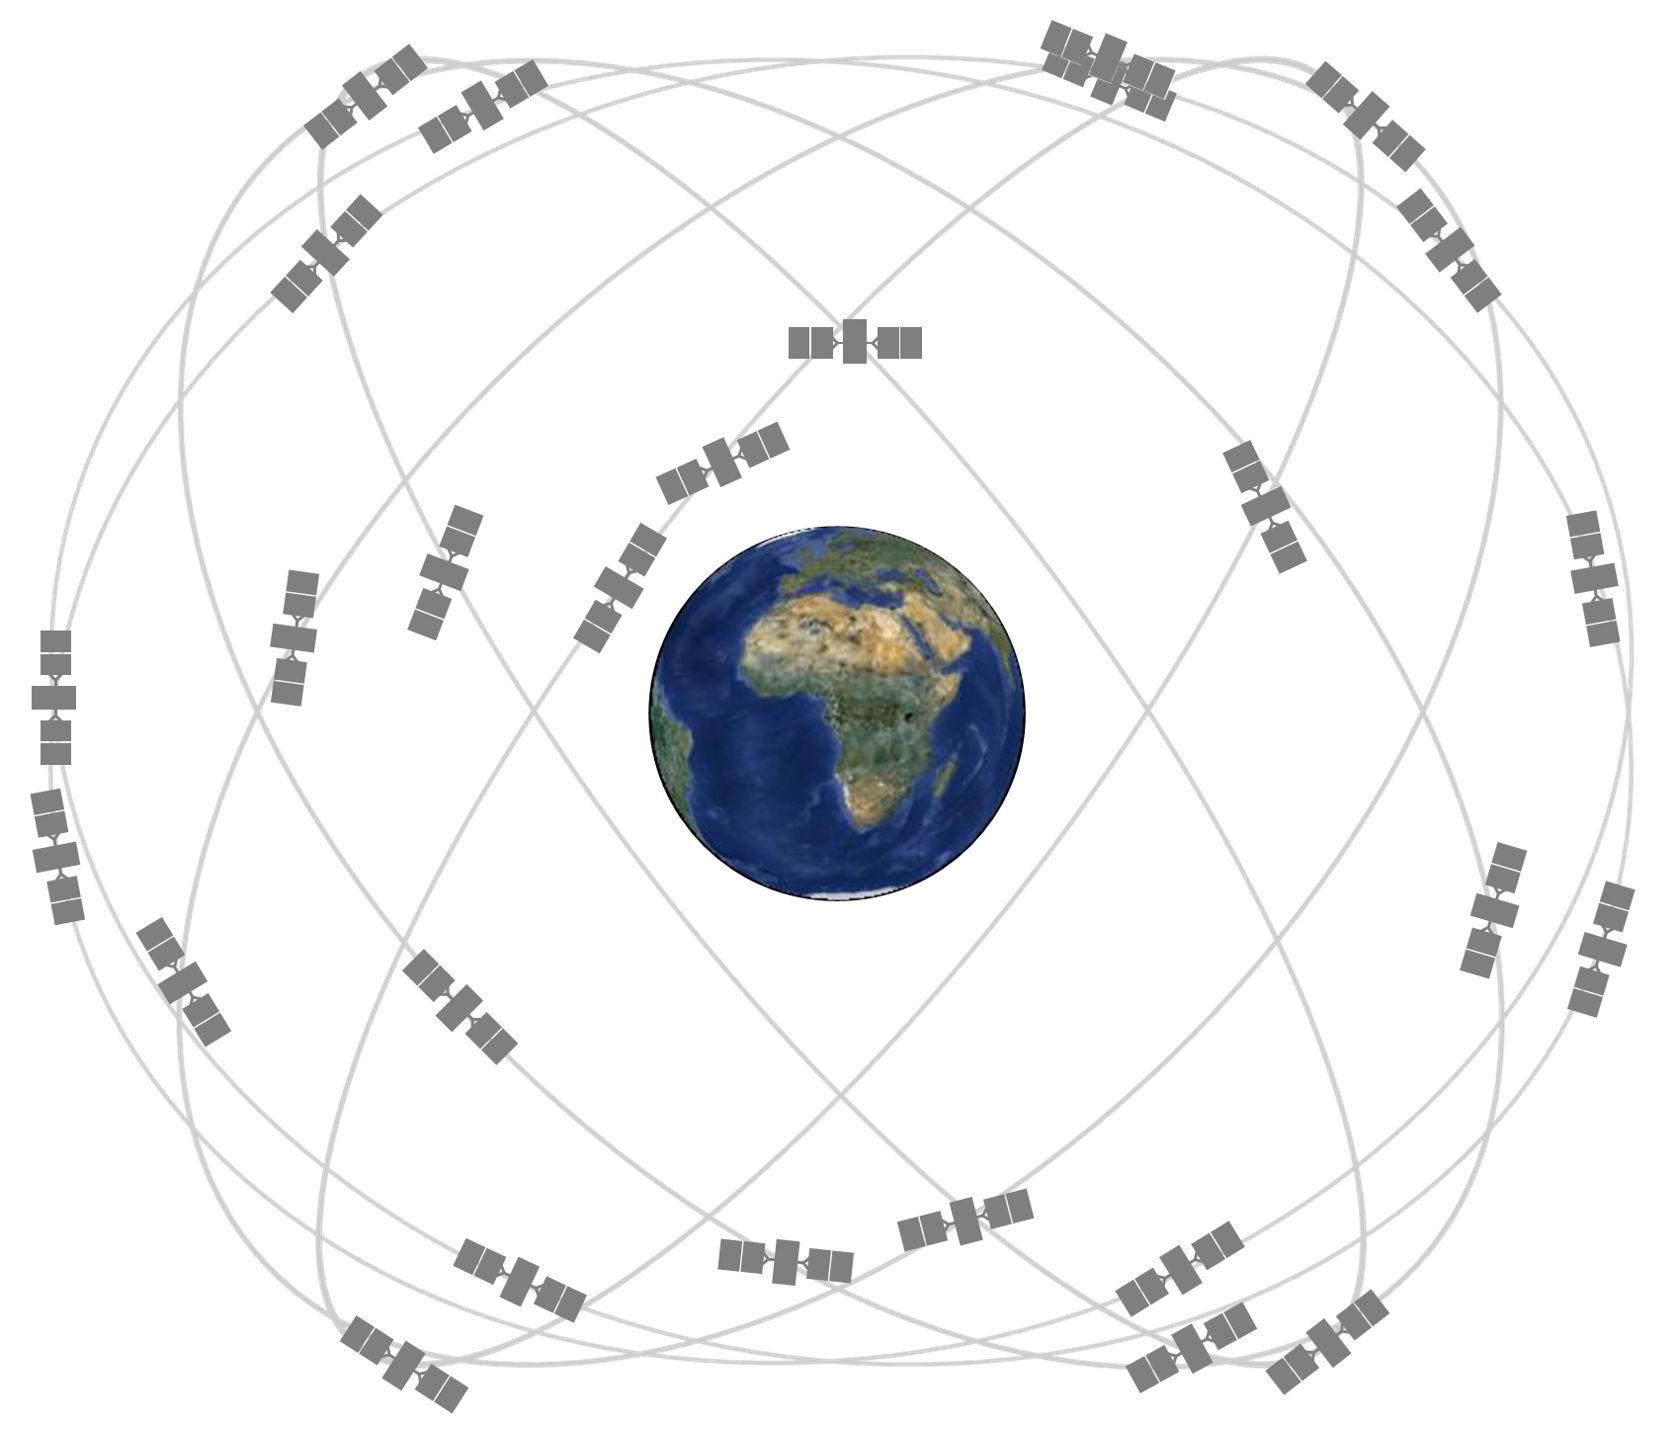 GPS衛星の軌道イメージ(画像提供:米国政府)